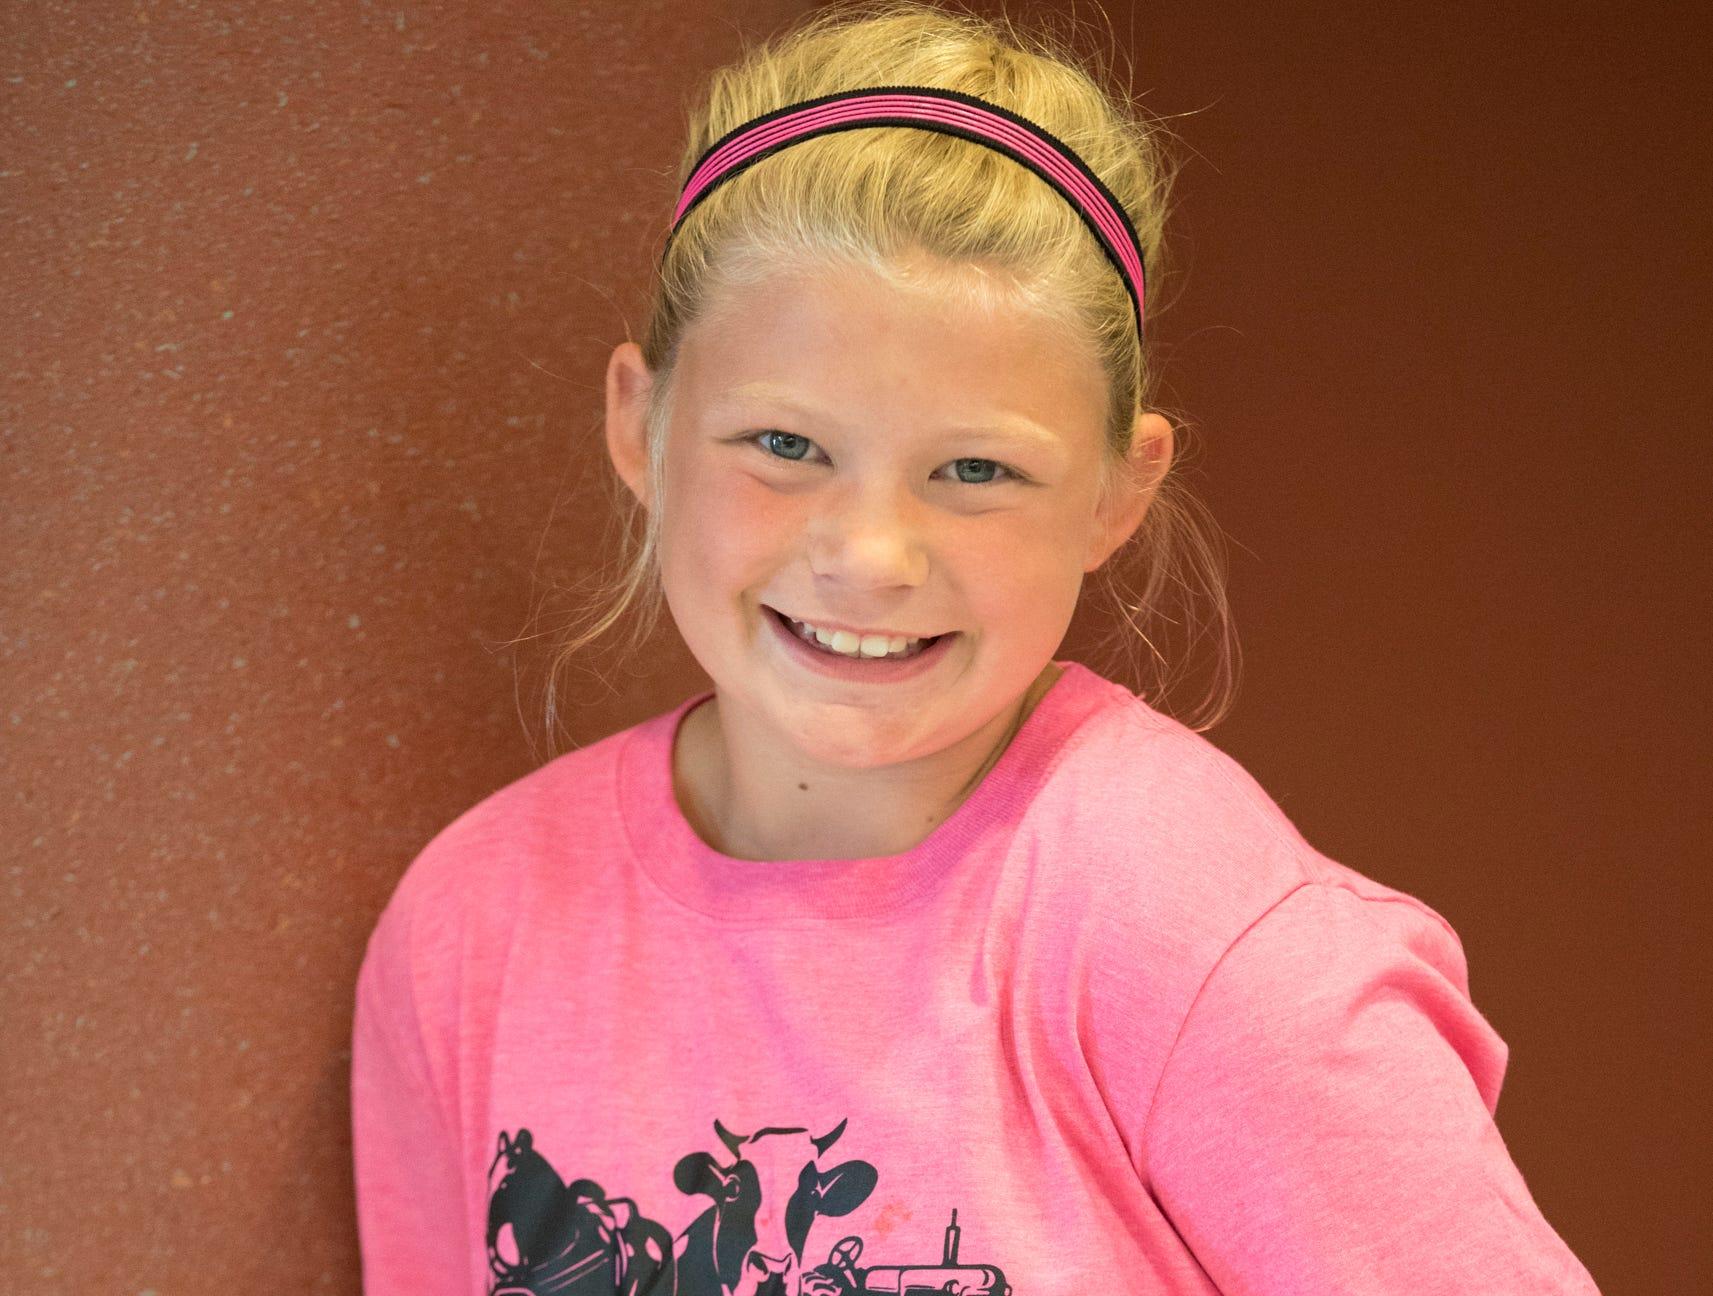 Kyla Litter, 10, Elite Eagles. Project: Scrapbooking